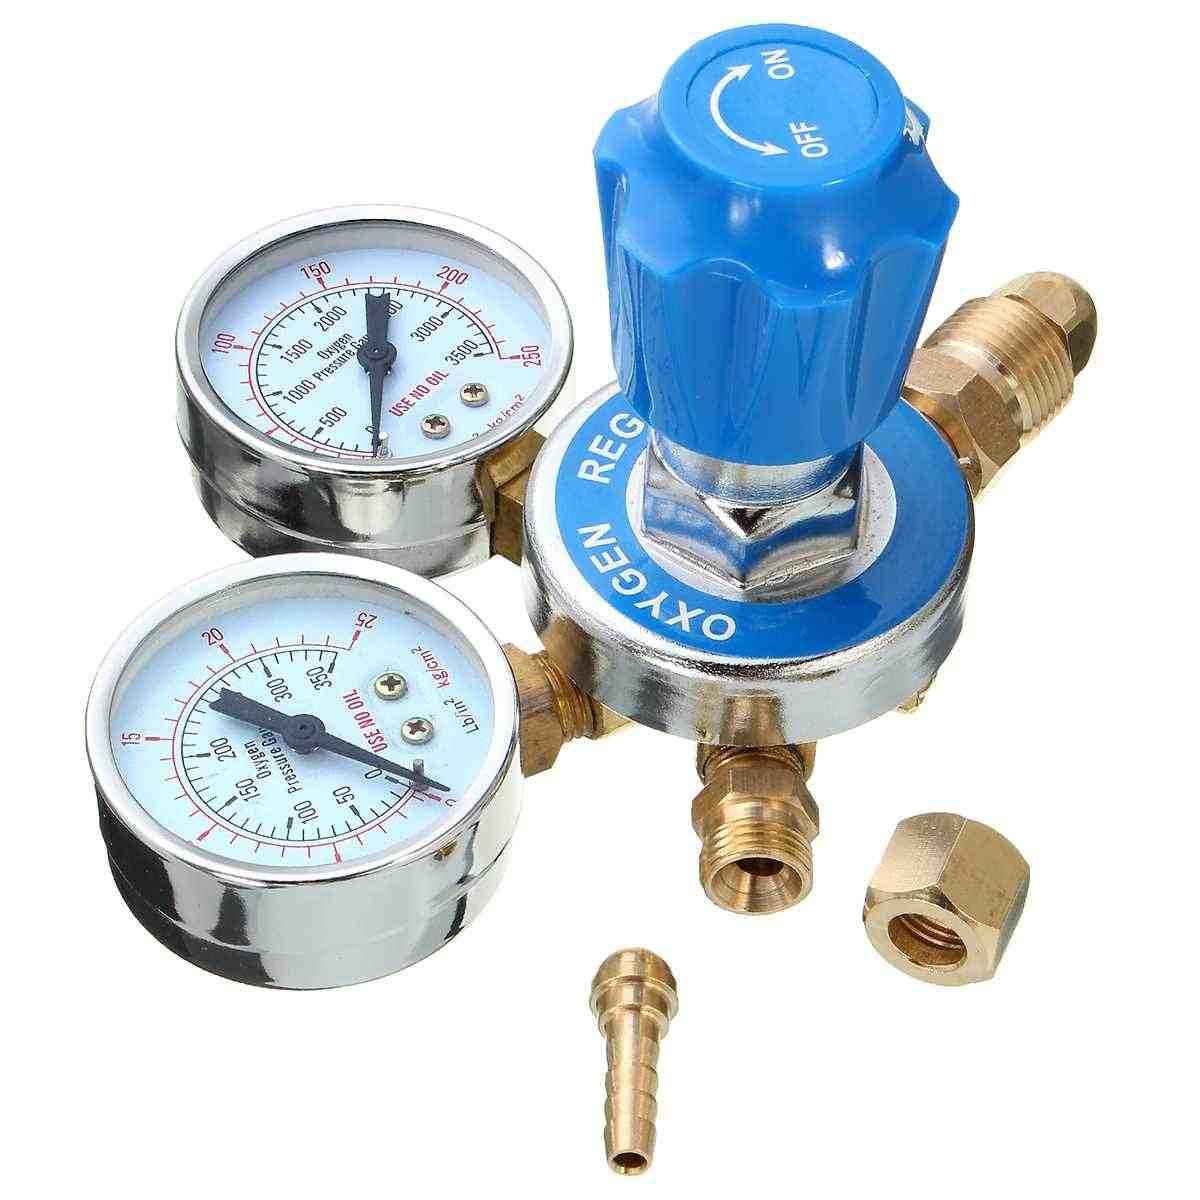 NEW Pressure Reducer o2 Pressure Manometer Pressure Regulator Welding Oxygen Brass